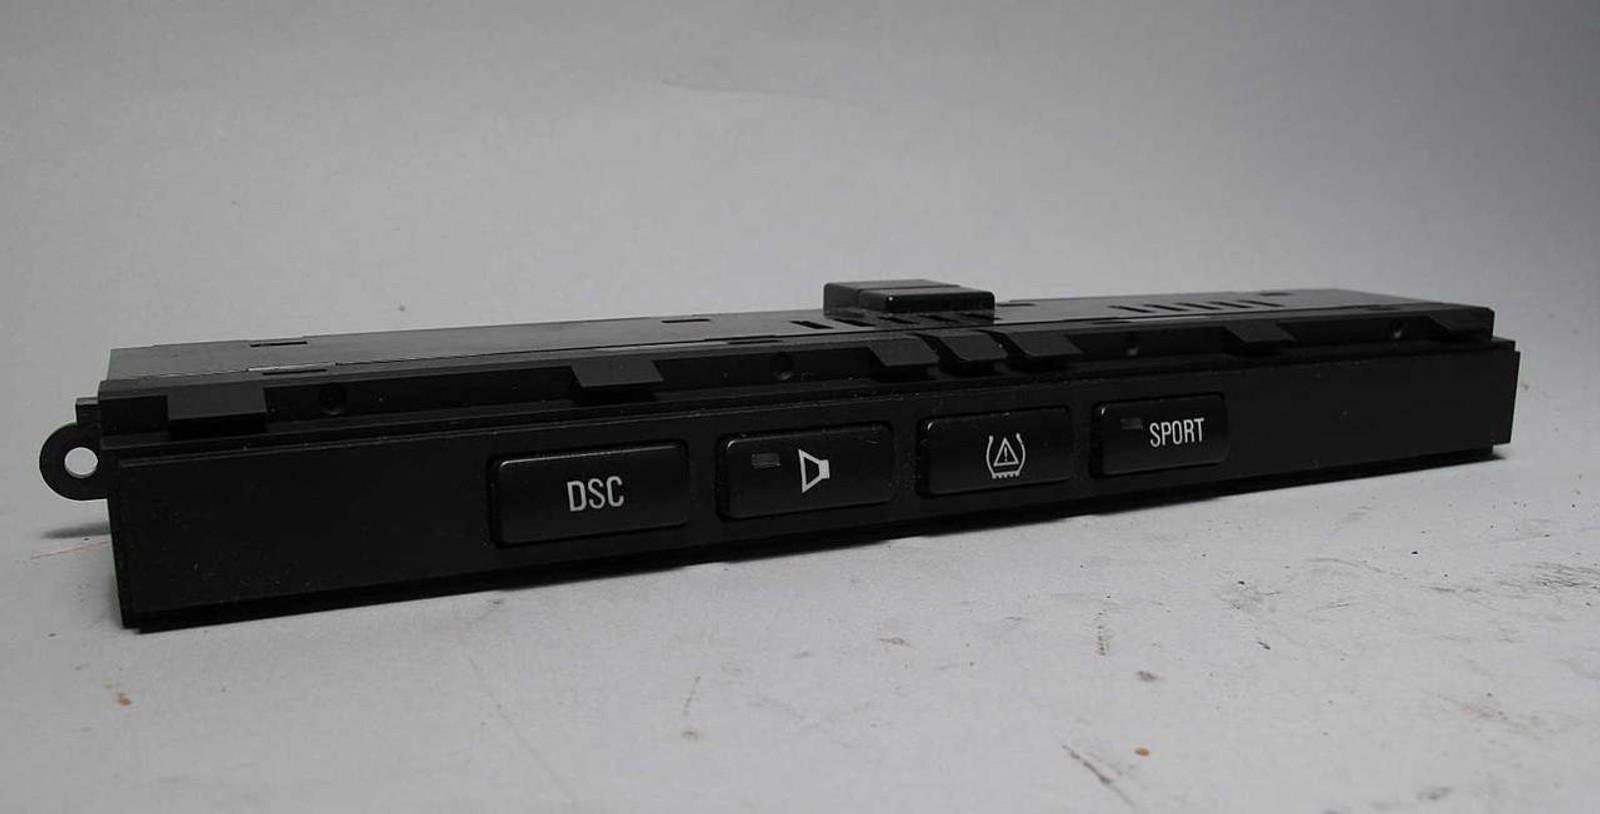 BMW E46 M3 Coupe Center Console Switch Unit DSC TPMS HK Sport 2001-2006 OEM  USED